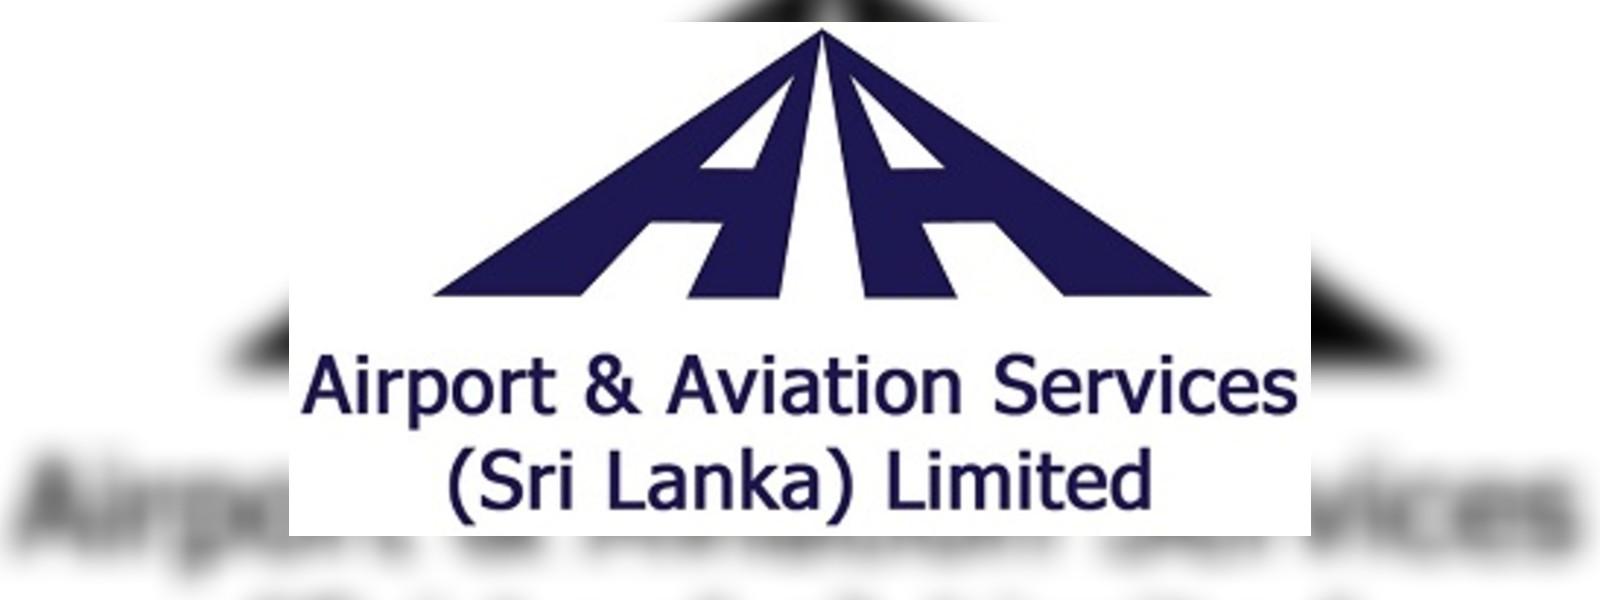 All passengers arriving in Sri Lanka will be screened